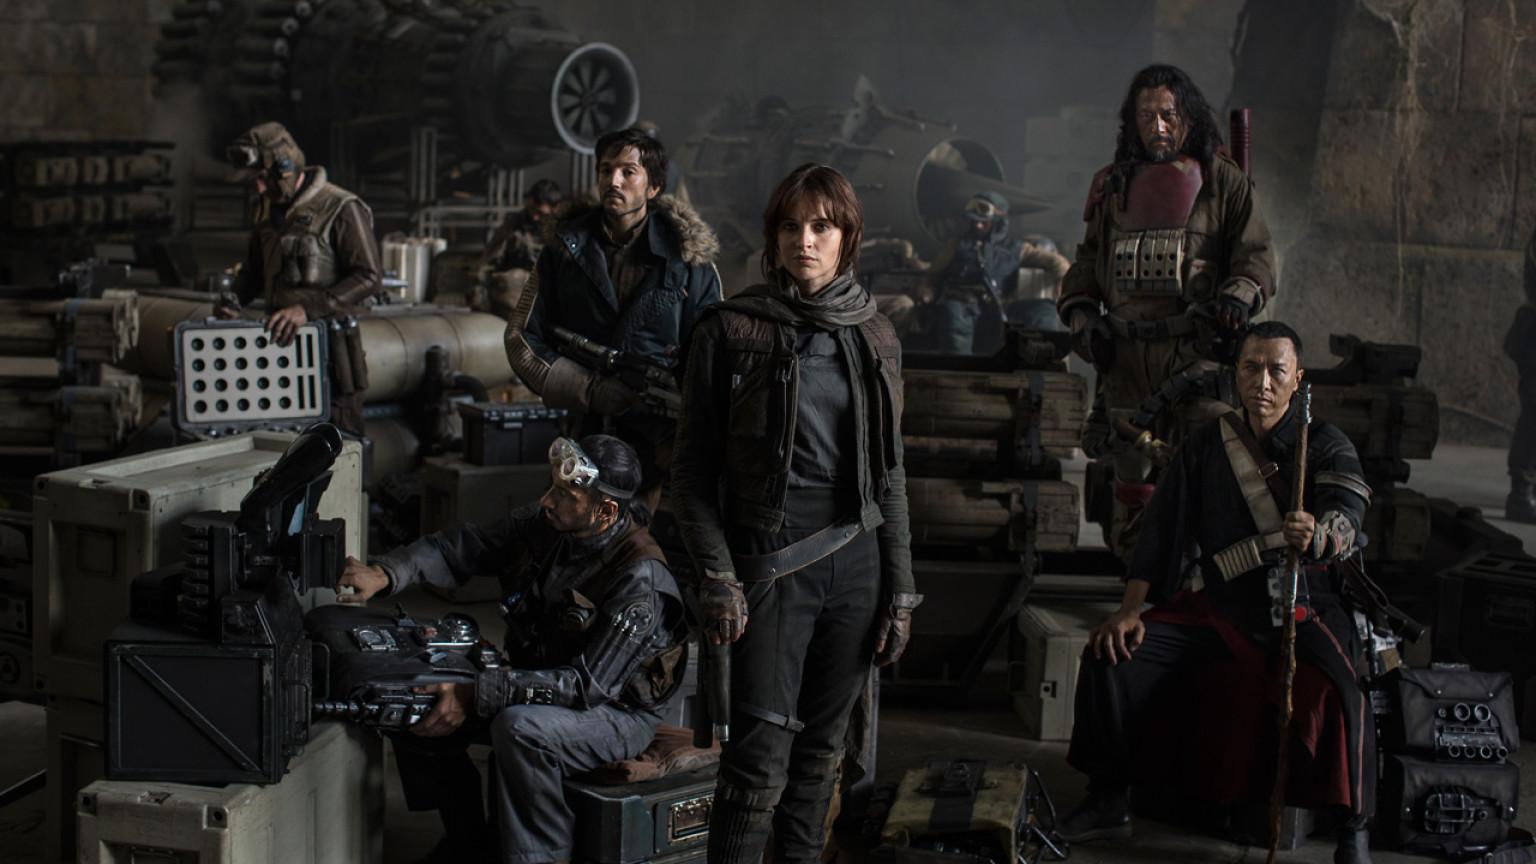 'Star Wars: Rogue One' Reveals Cast, Death Star Plot Line